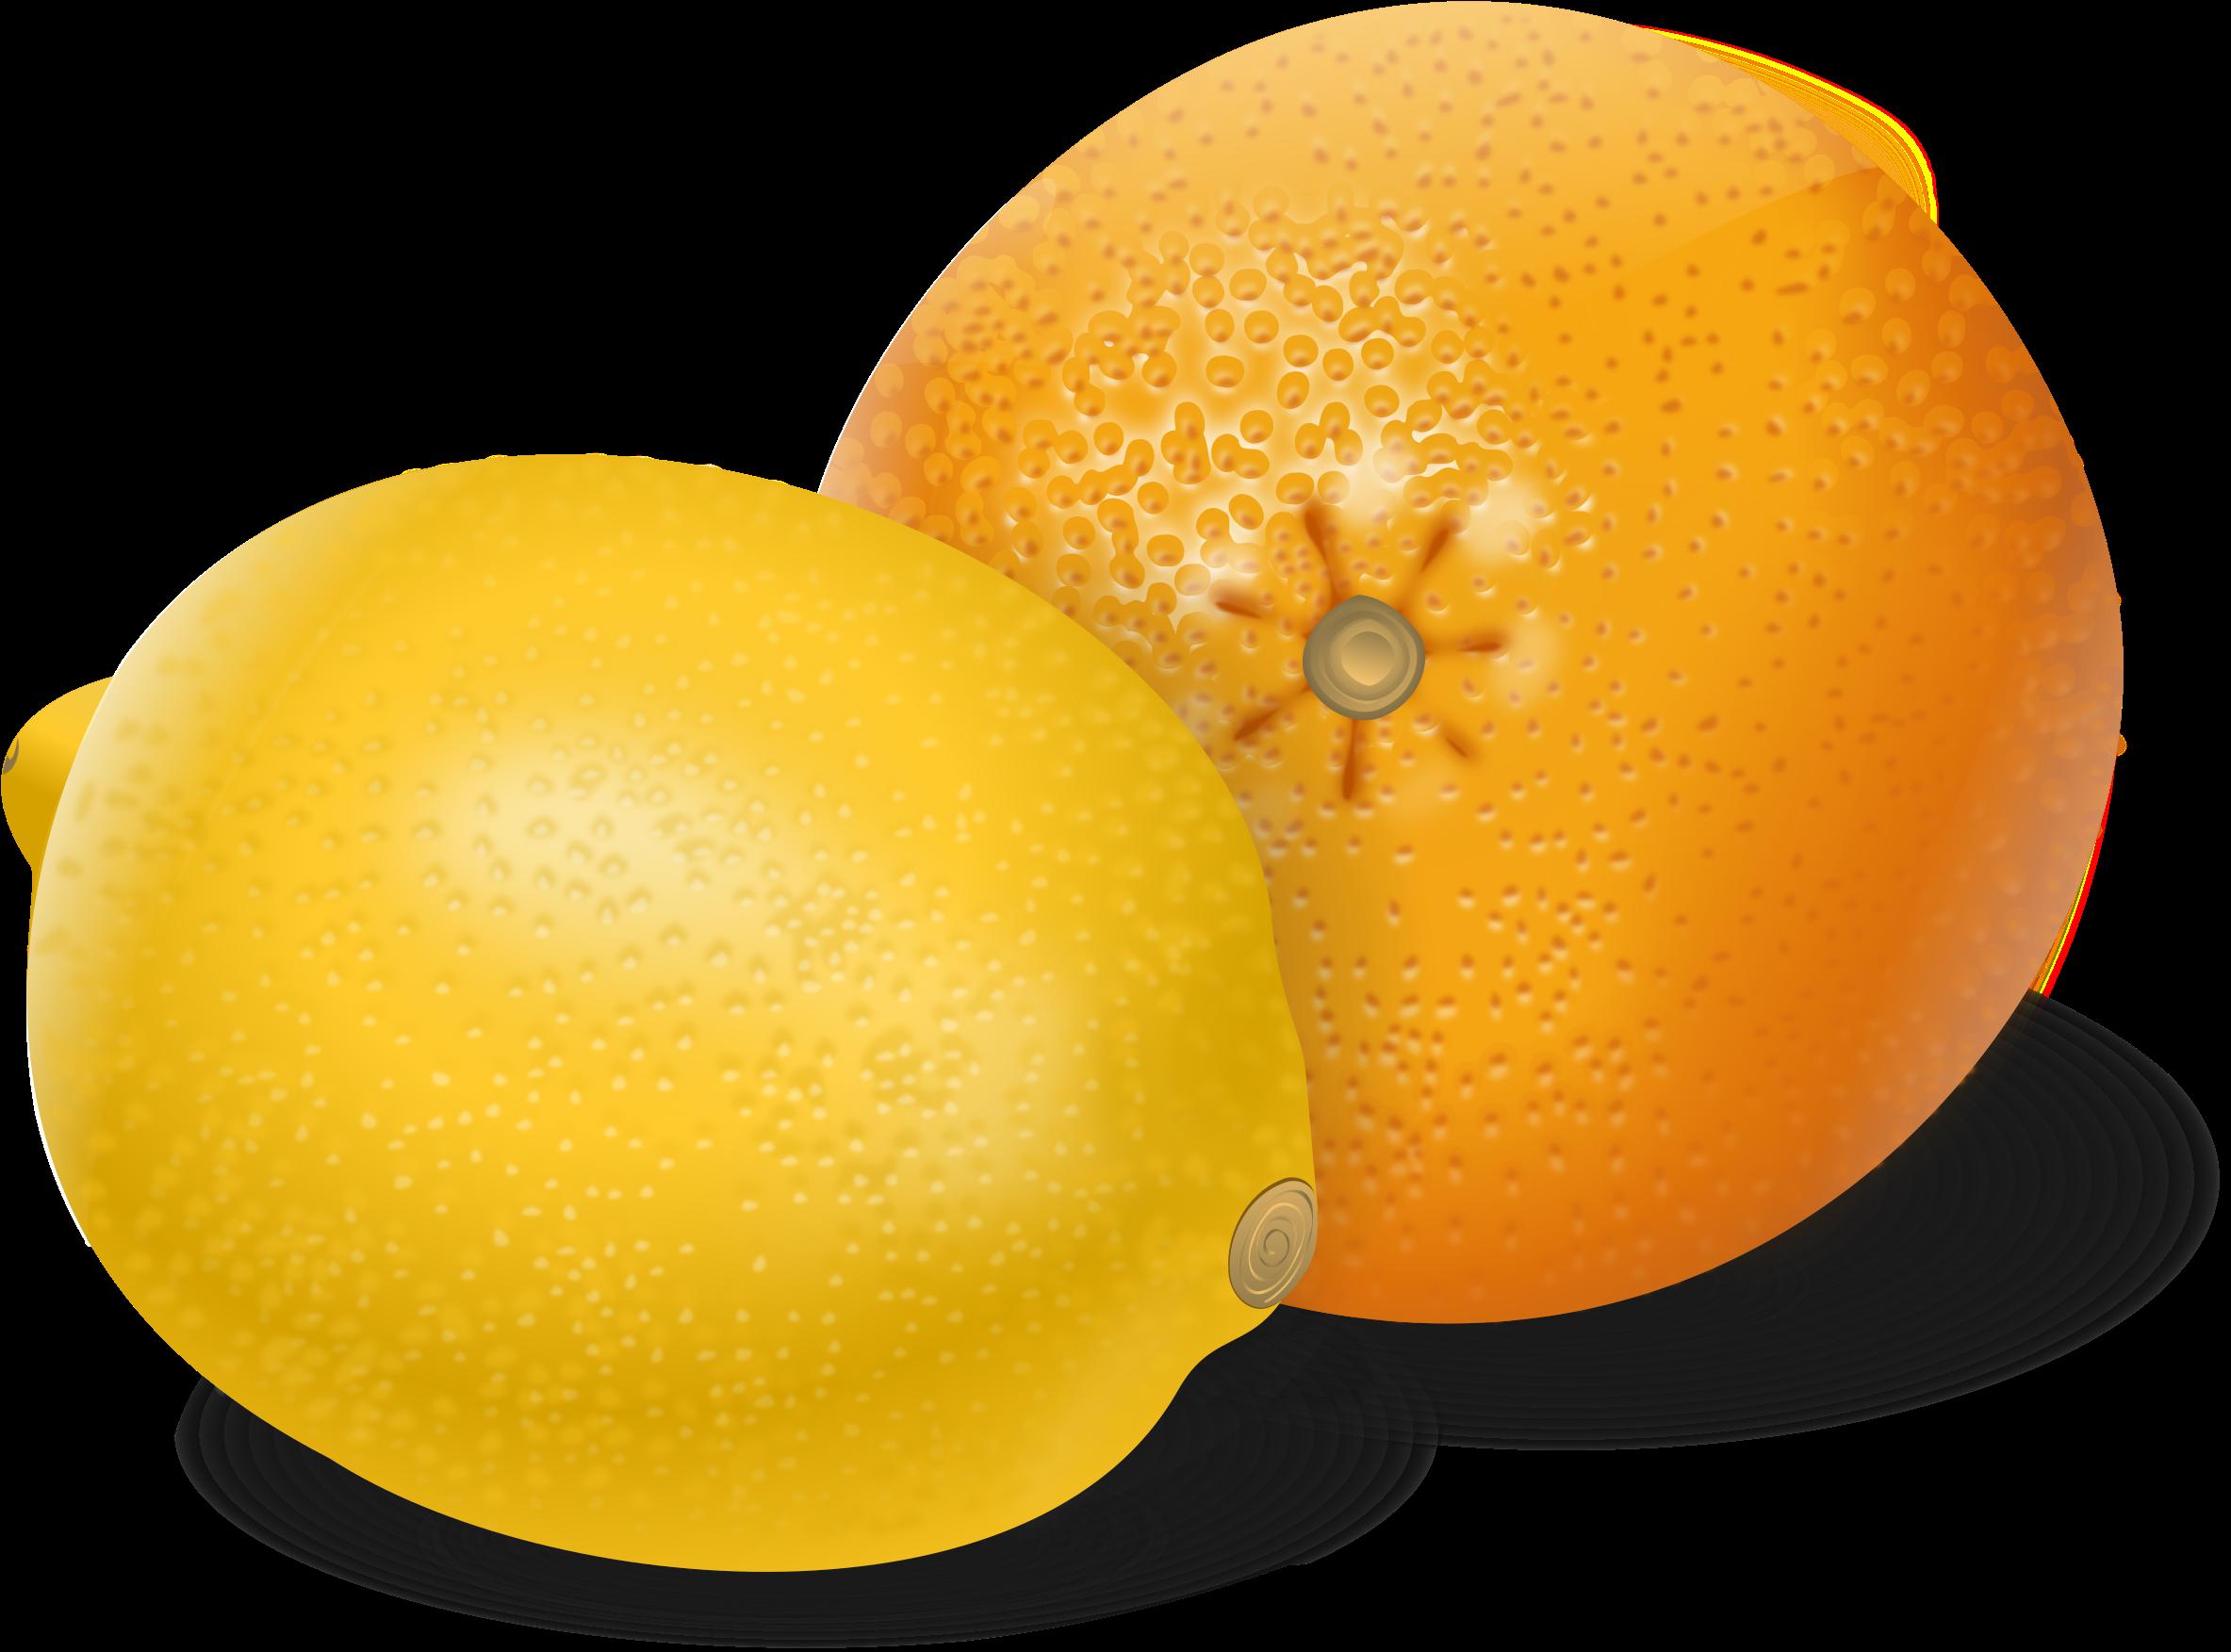 Lemons clipart orange. Hd image oranges and